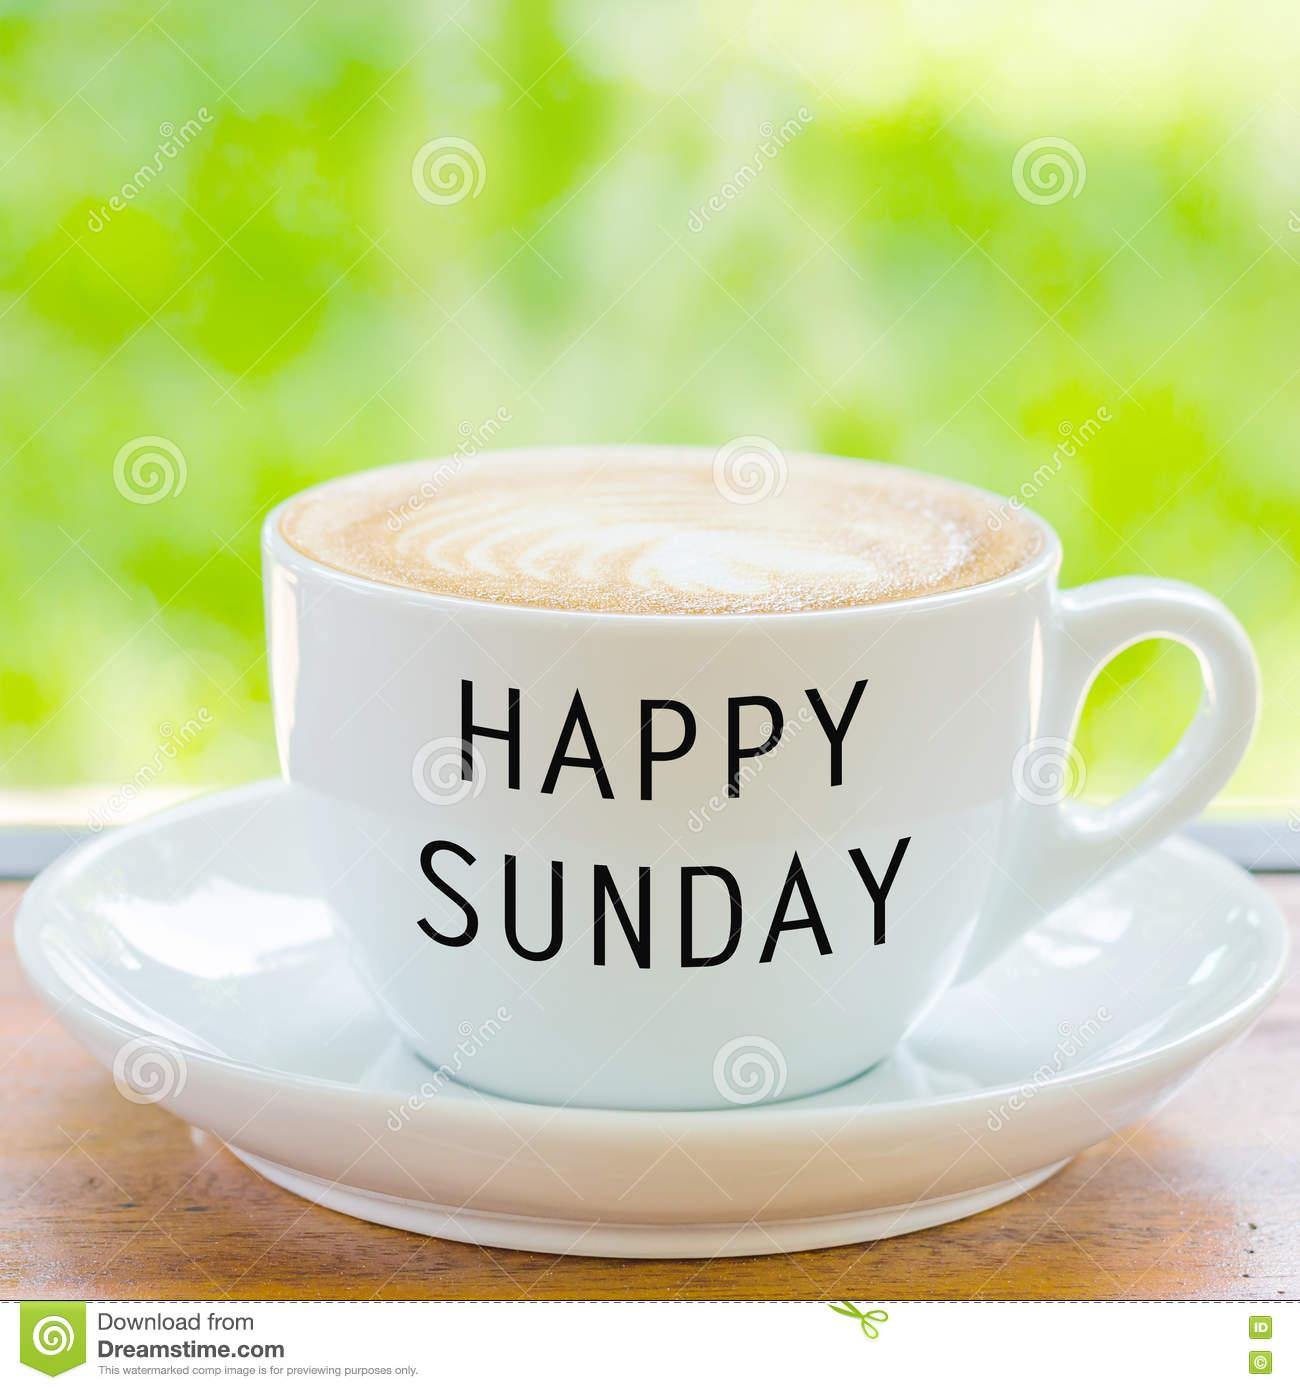 Happy Sunday on coffee cup stock photo. Image of closeup - 73937938 #sundayCoffee